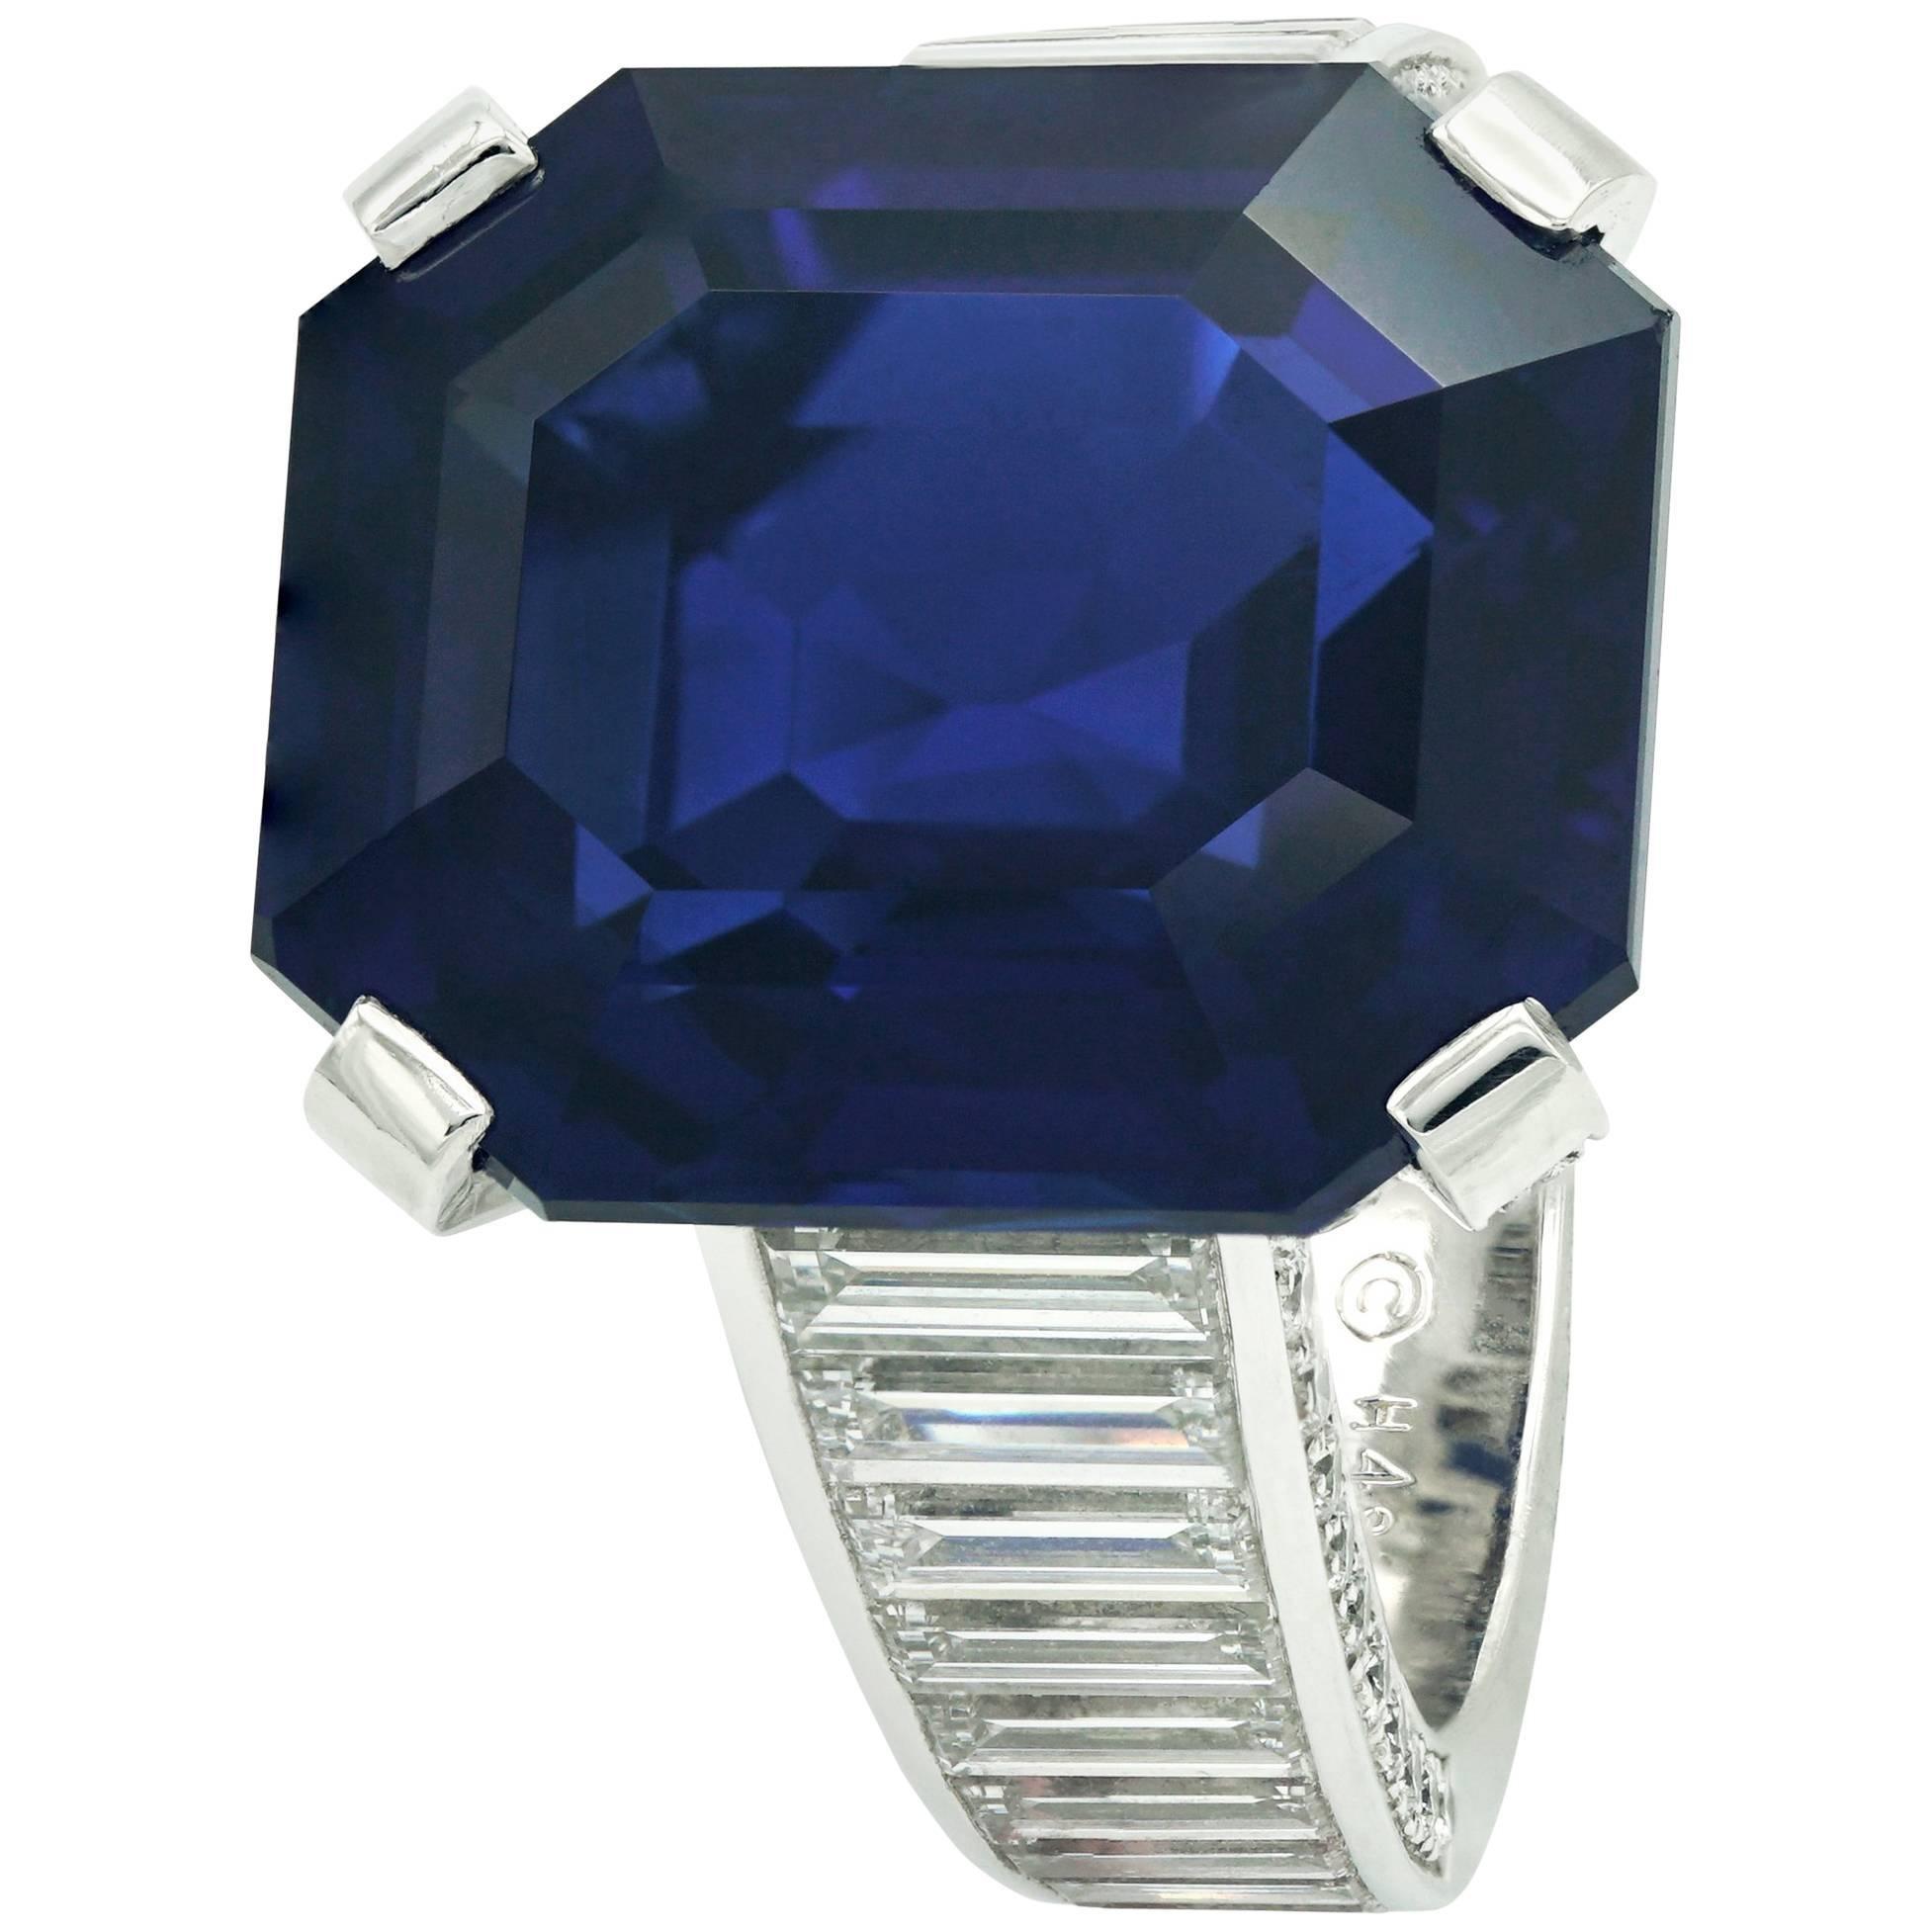 Cartier Ring Royal Blue Sapphire Emerald Cut and Diamonds Baguettes